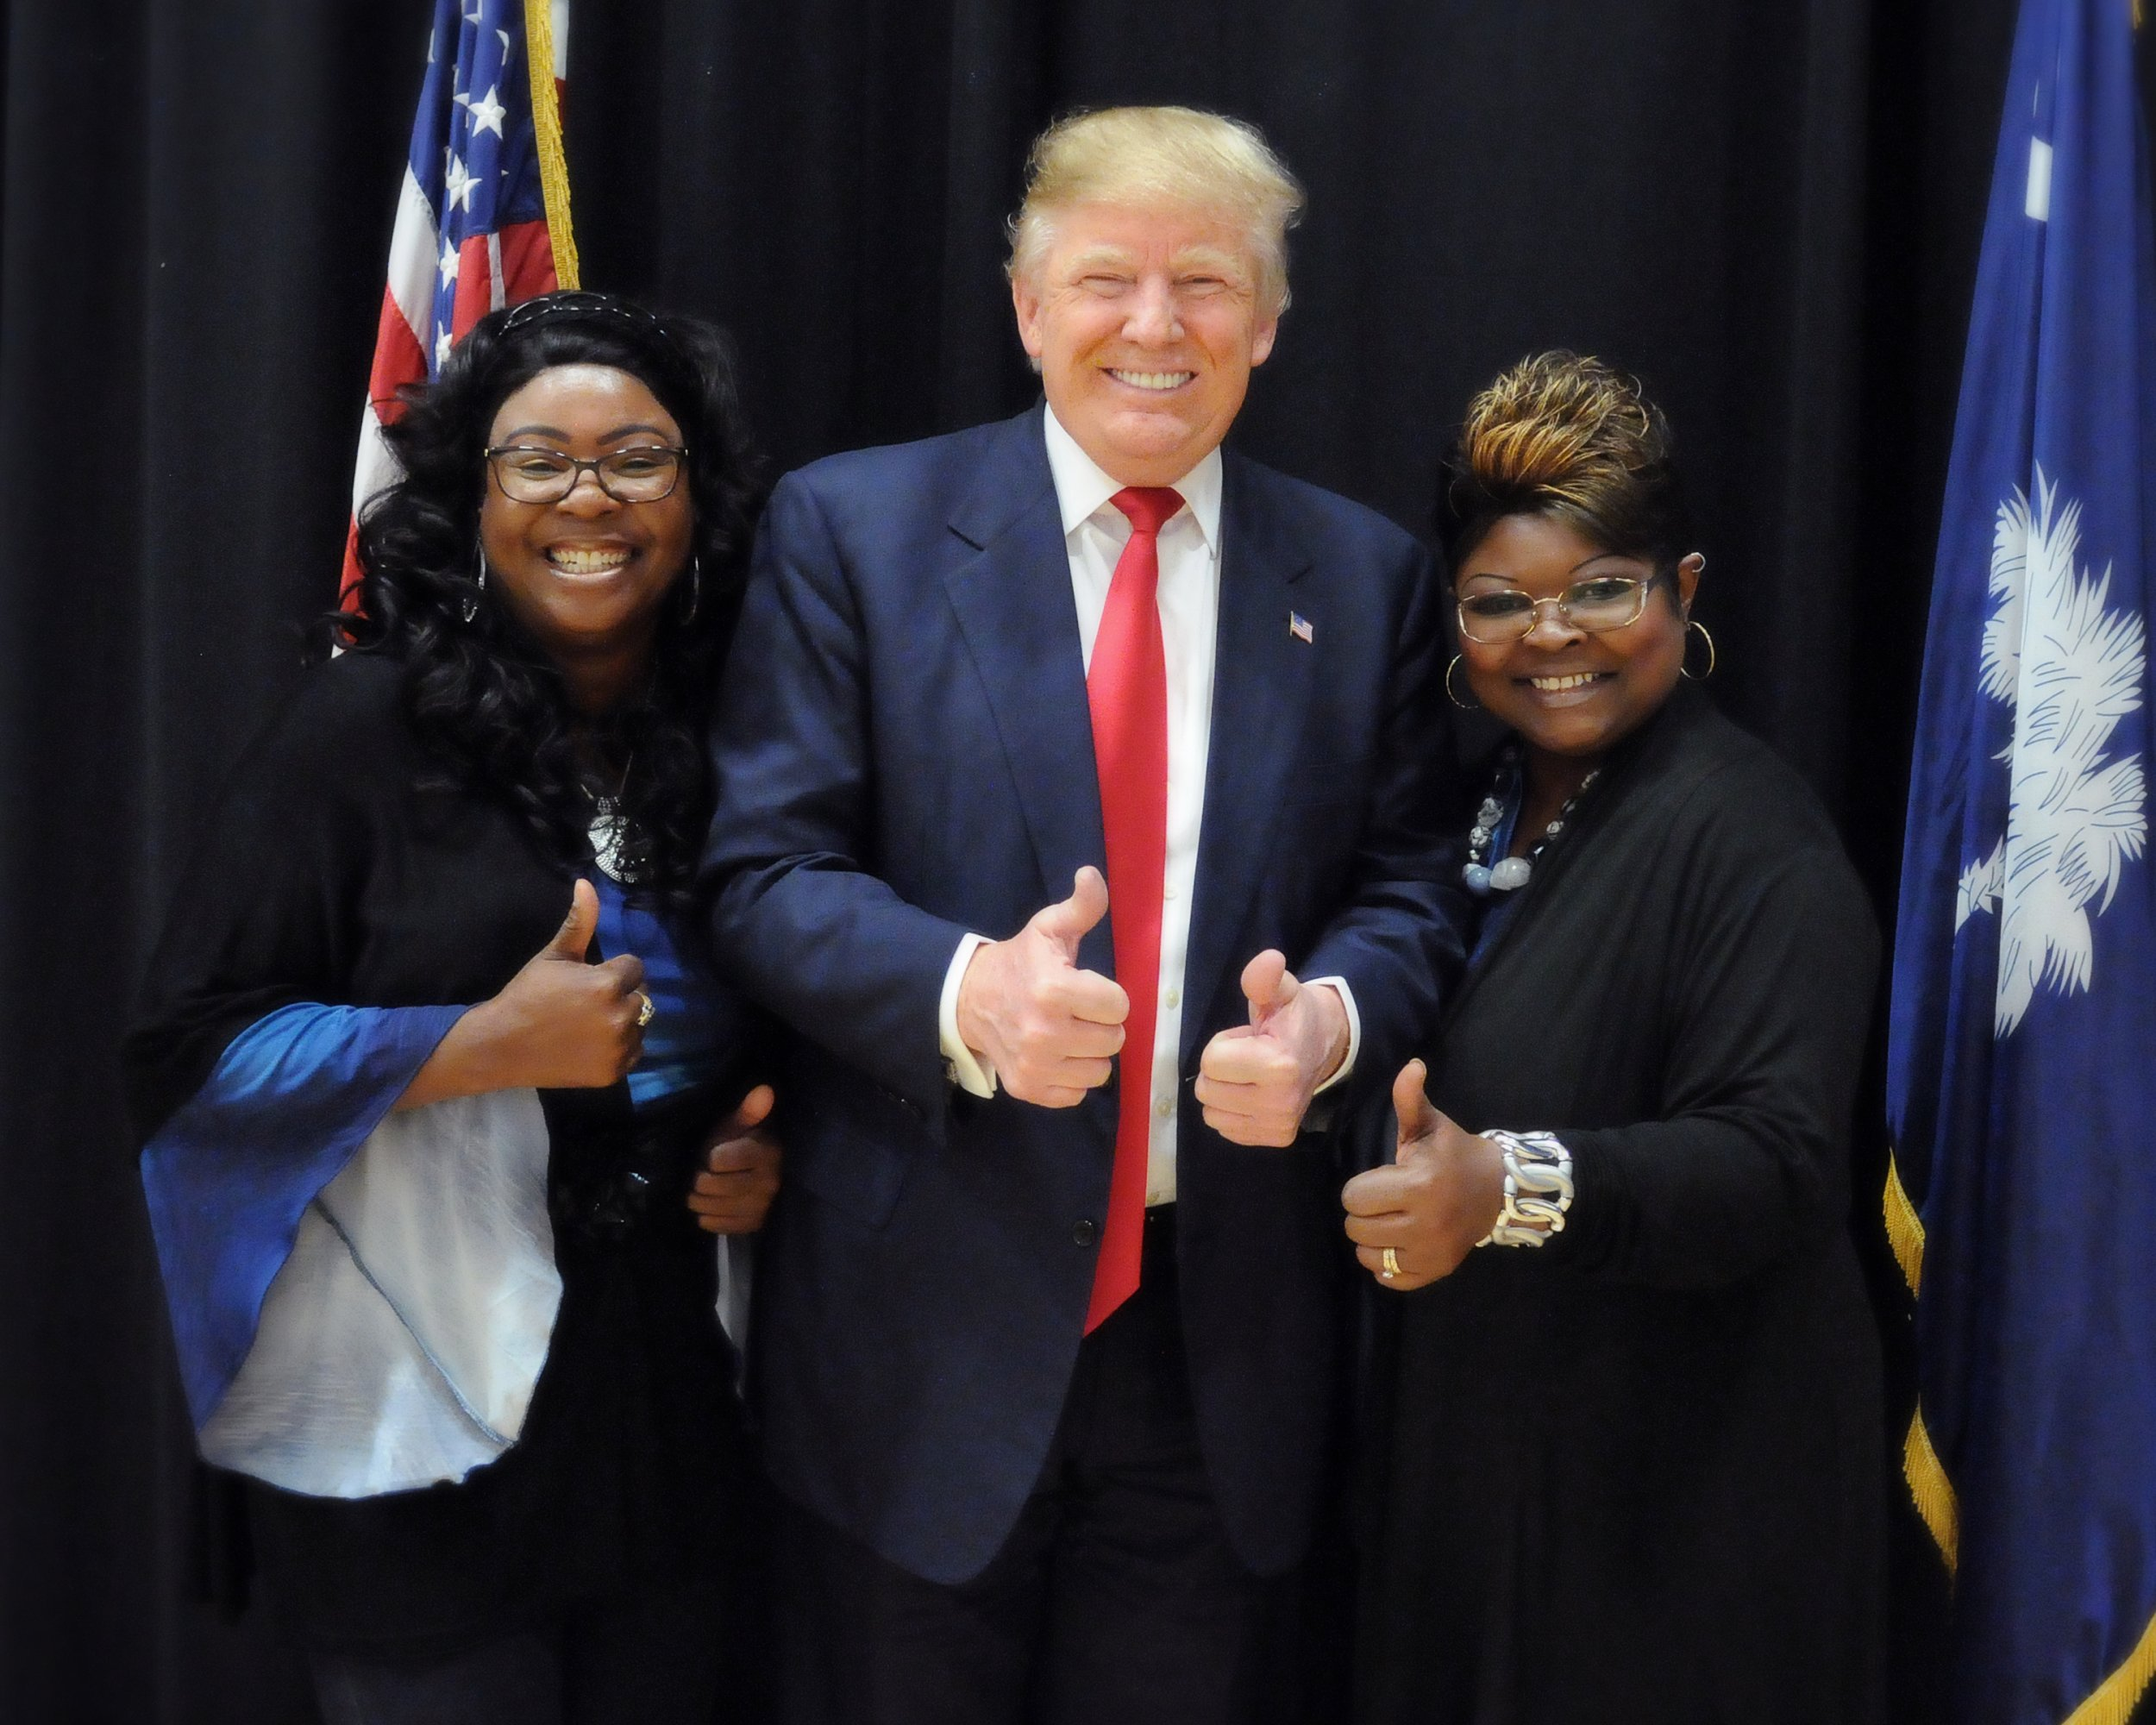 07_22_TrumpWomen_01